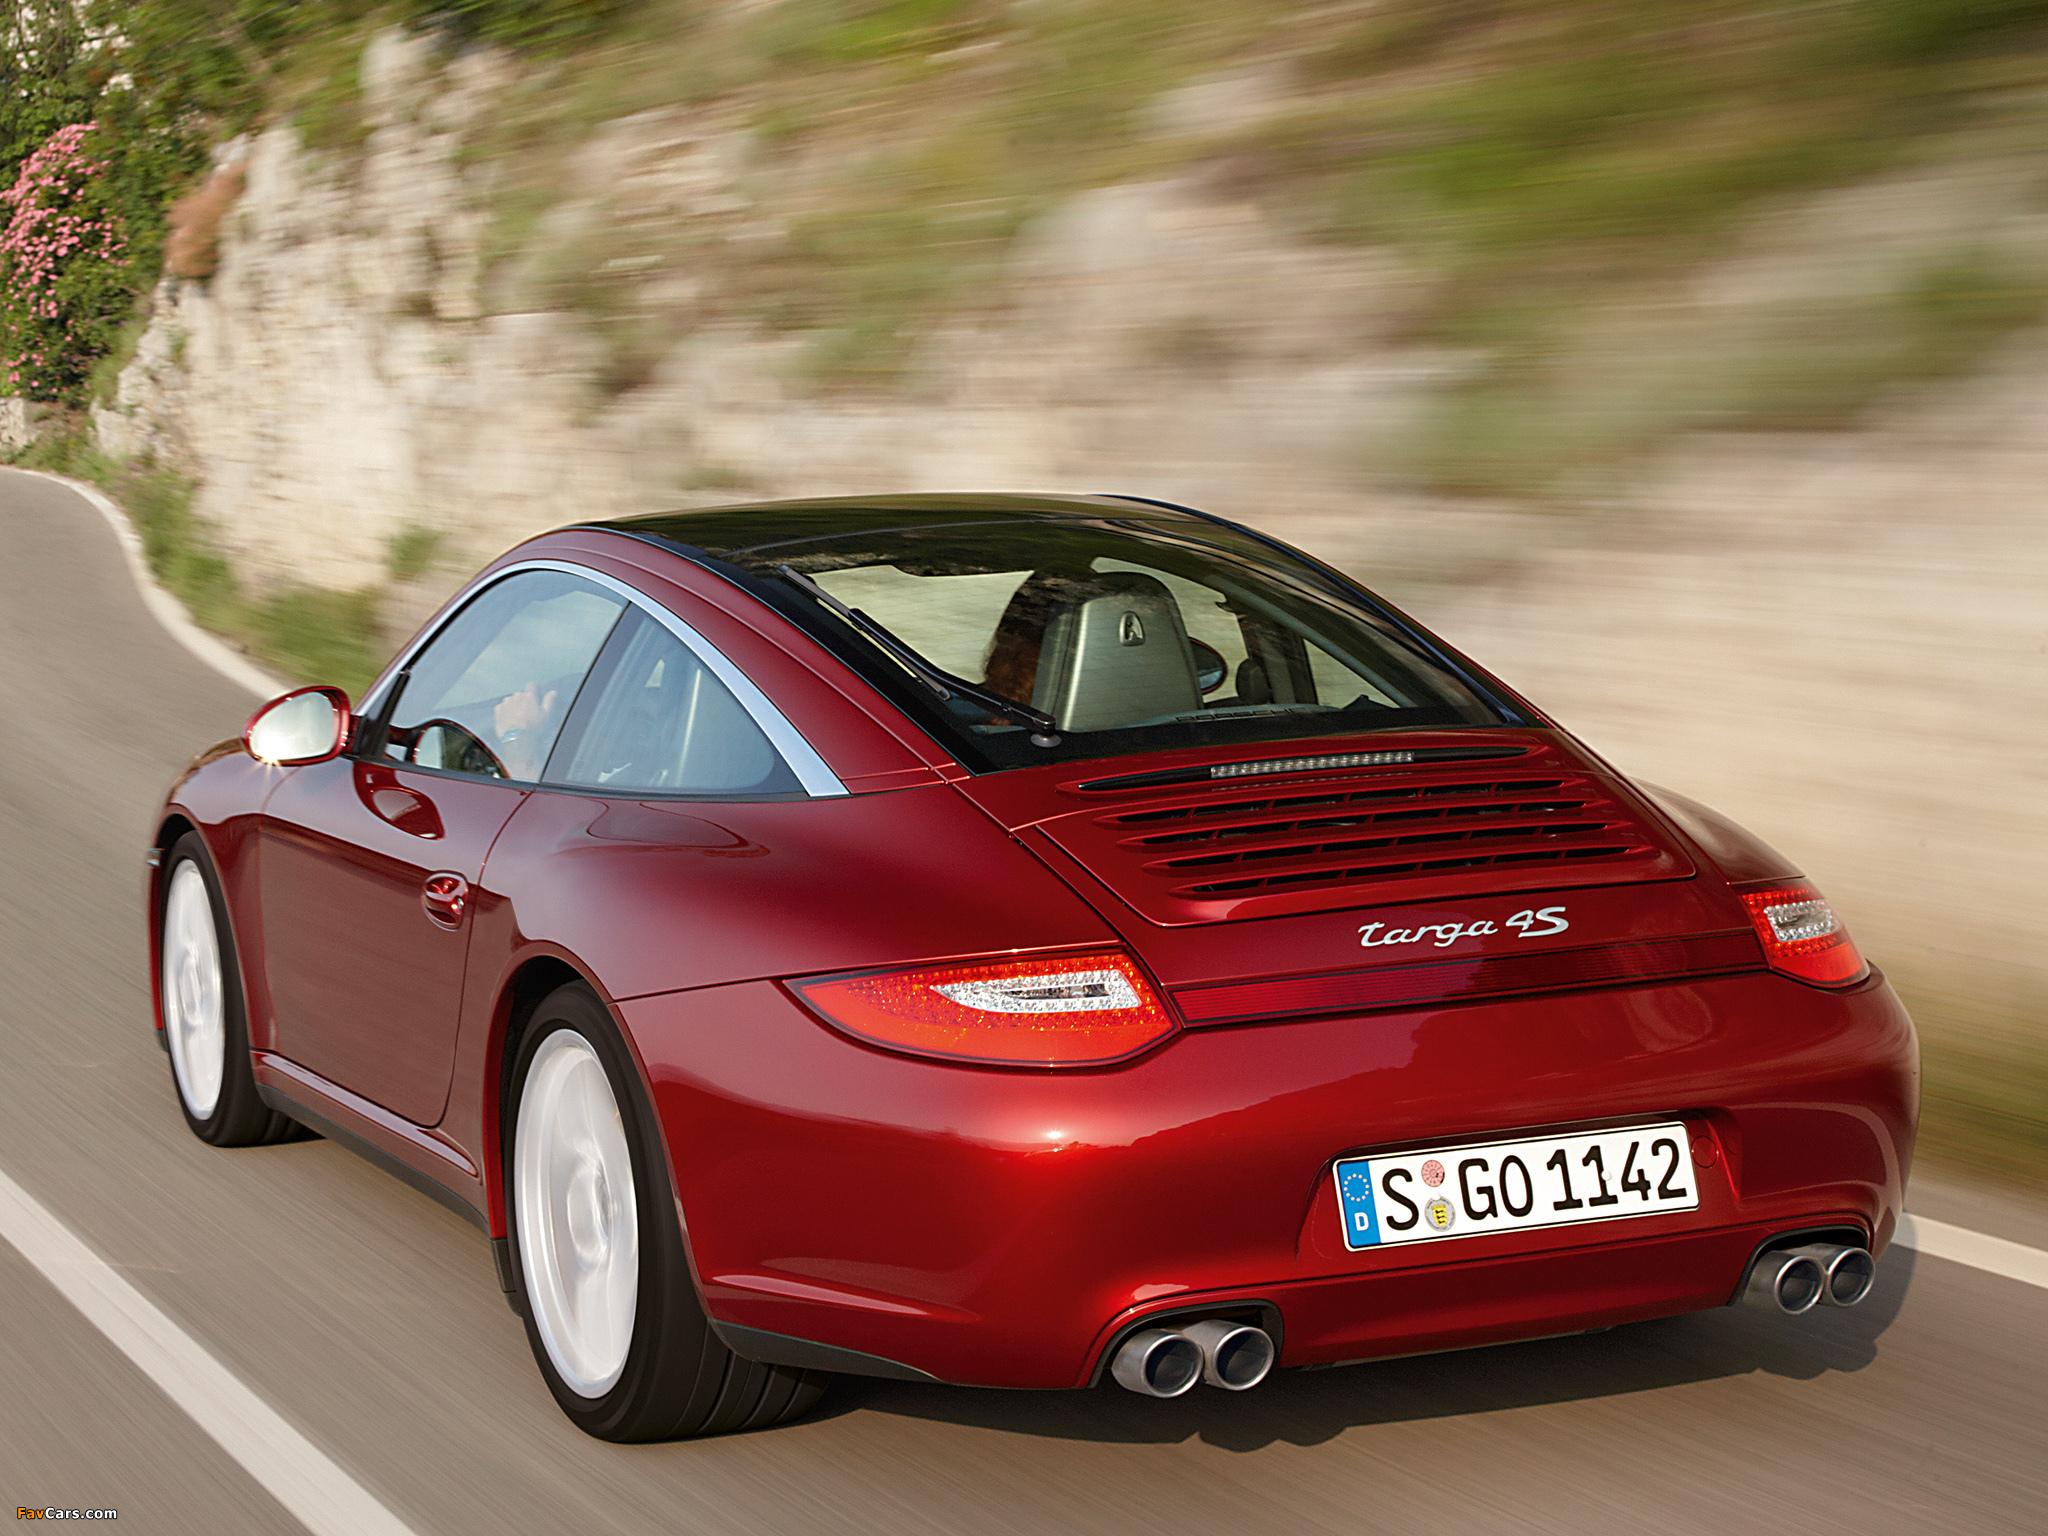 Porsche 911 Targa 4s 997 2008 Pictures 2048x1536